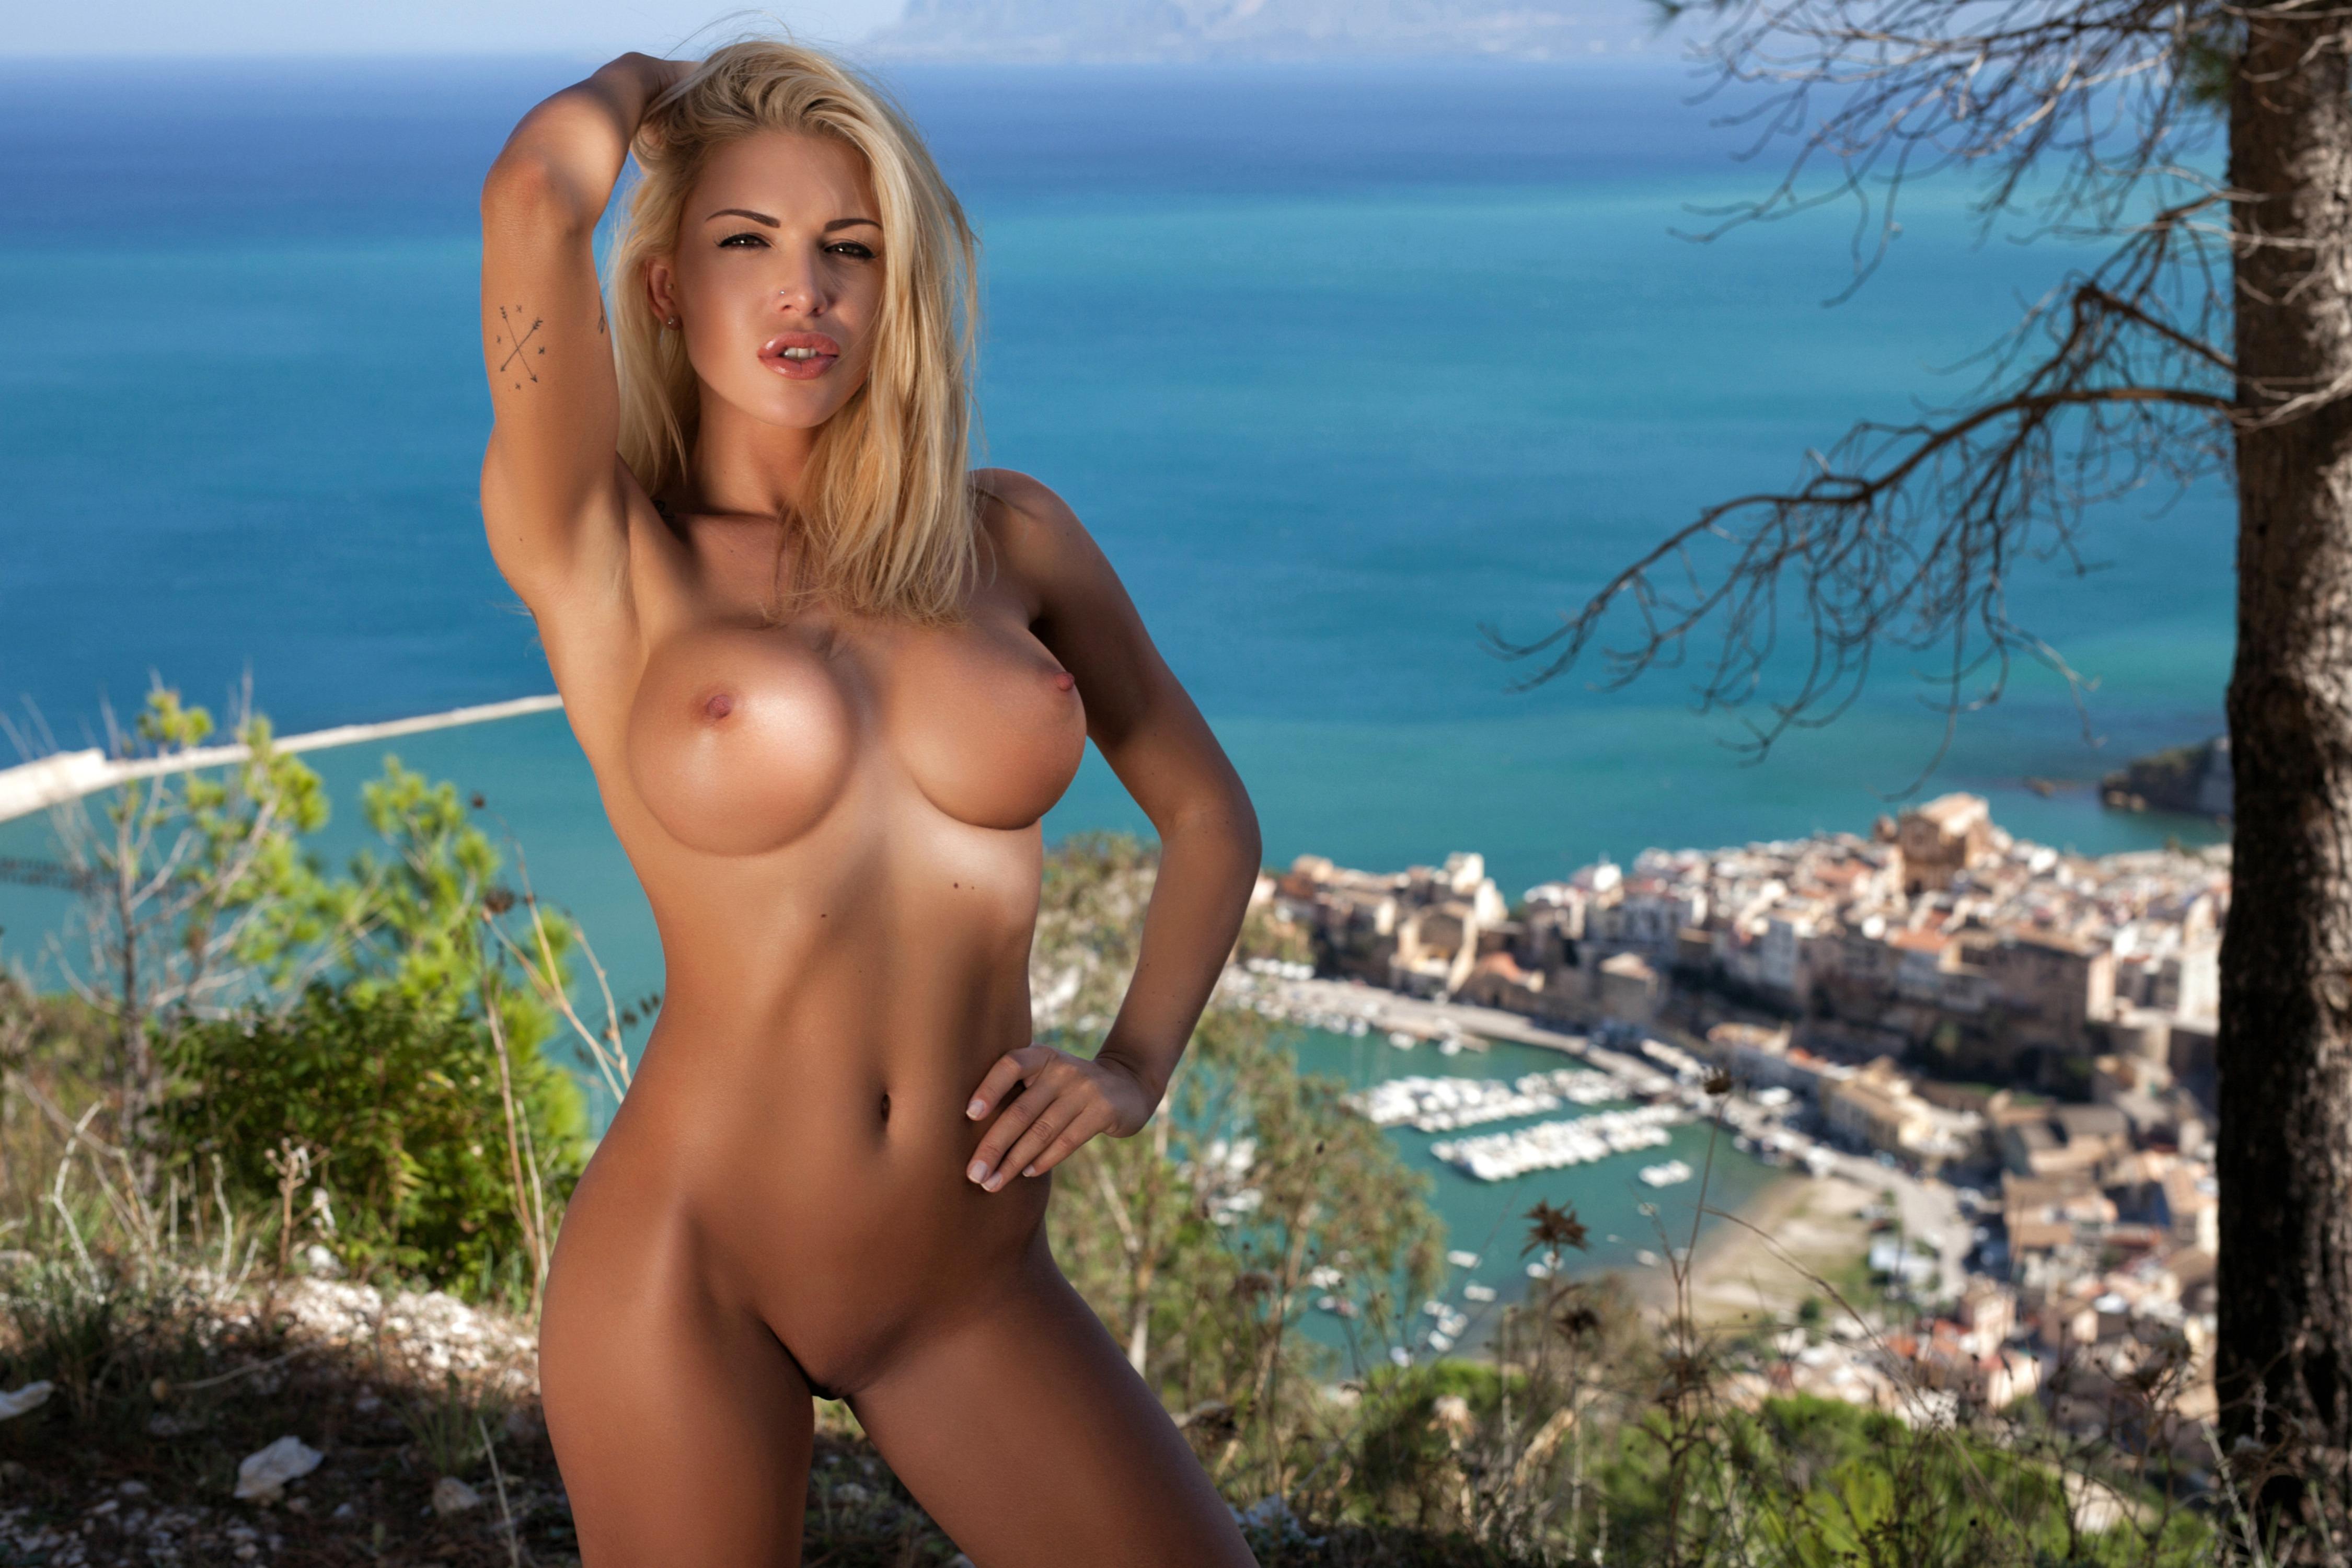 Wallpaper Brigitta, Blonde, Outdoors, Naked, Big Tits, Hard Nipples, Shaved Pussy, Tattoos, Hi-Q, Tanned, Boobs, Tits Desktop Wallpaper - Girls -9660